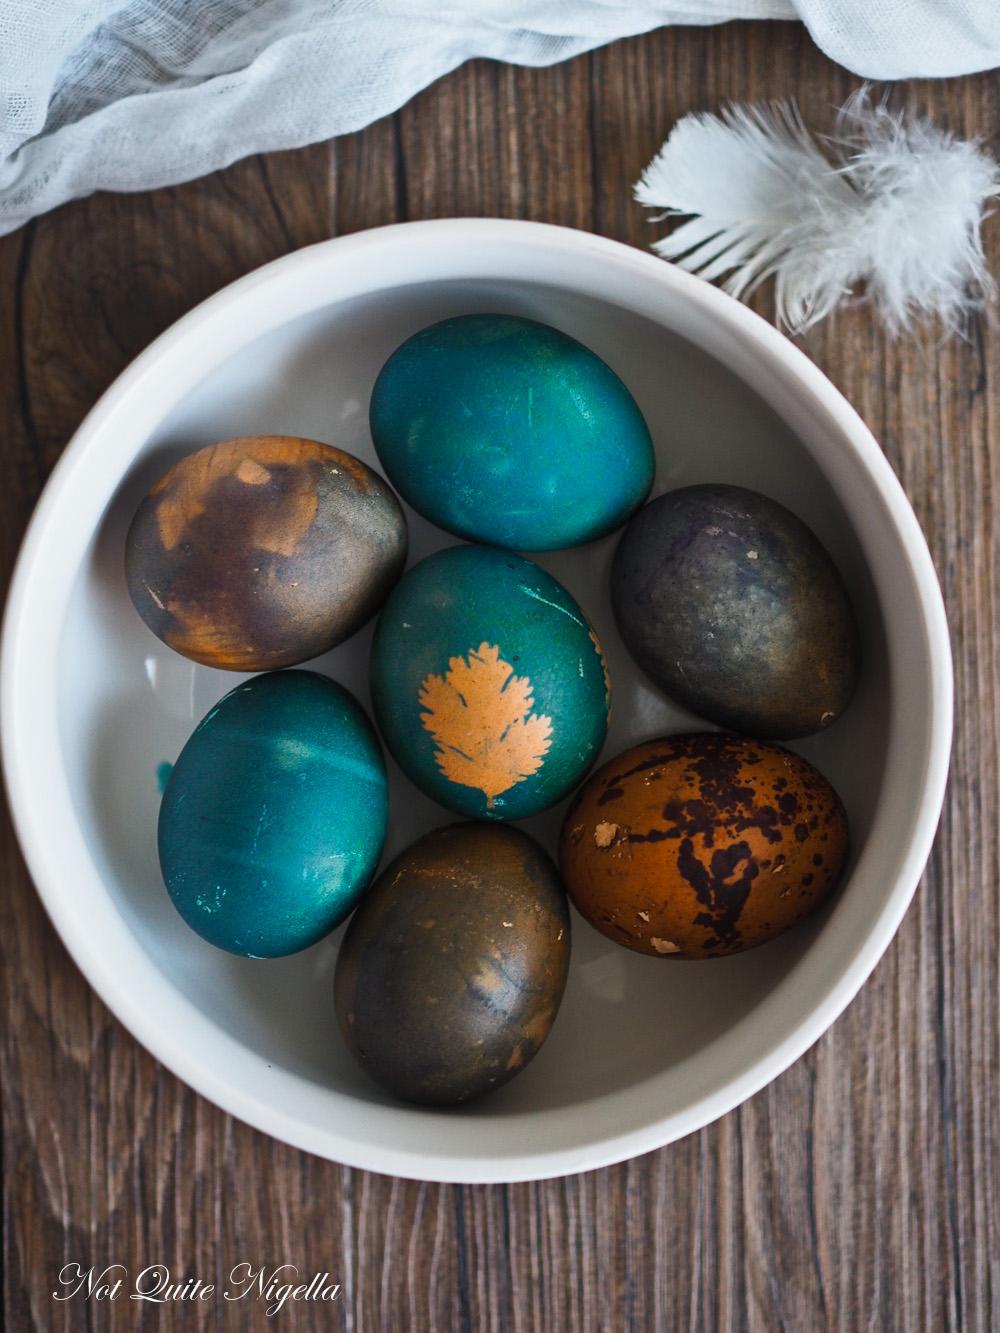 Top 5 Easter Recipes